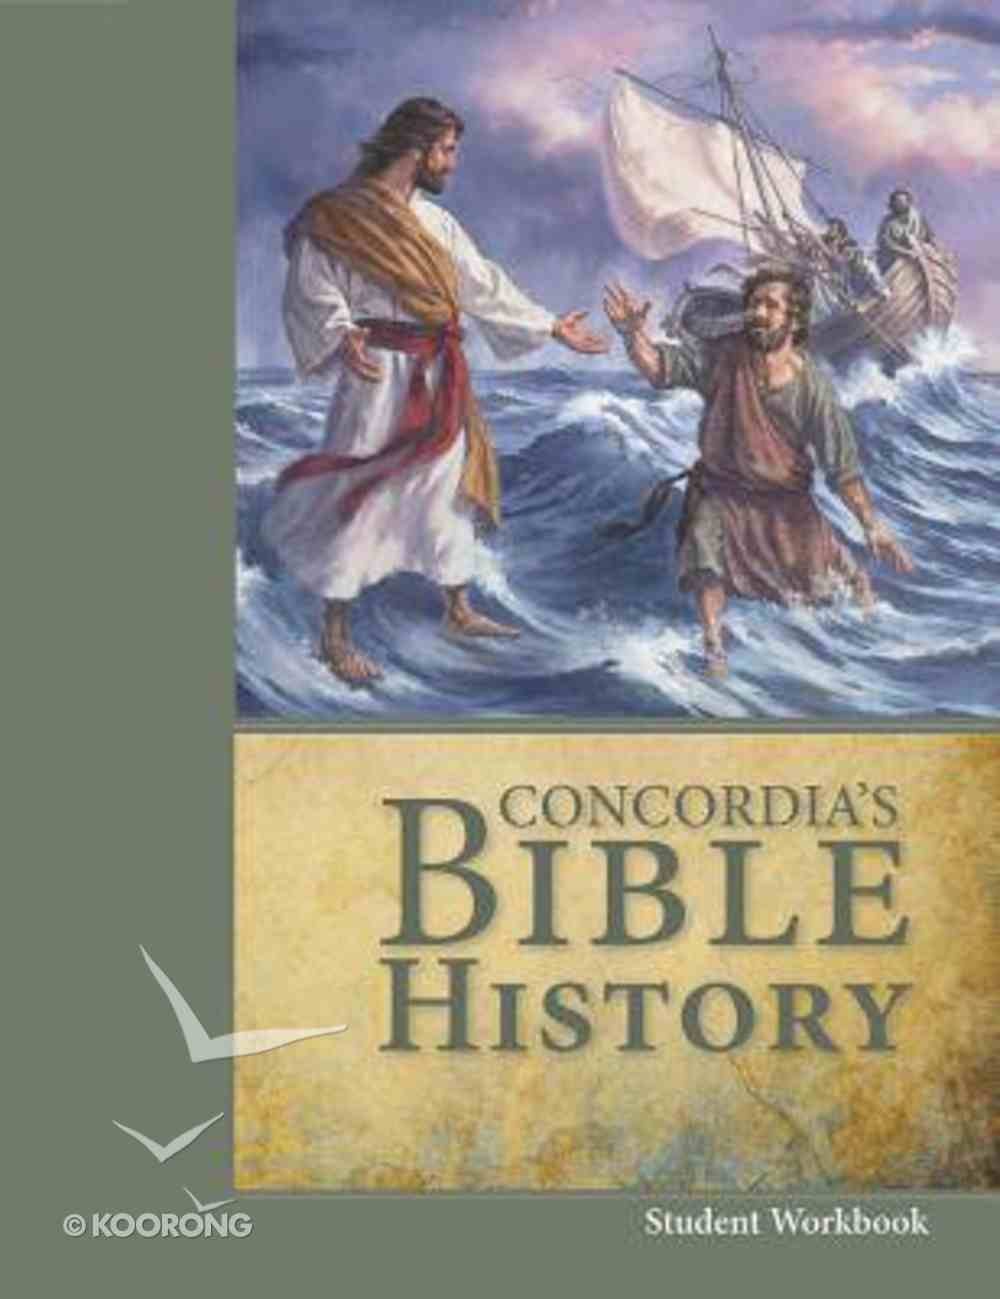 Concordia's Bible History (Workbook) Paperback